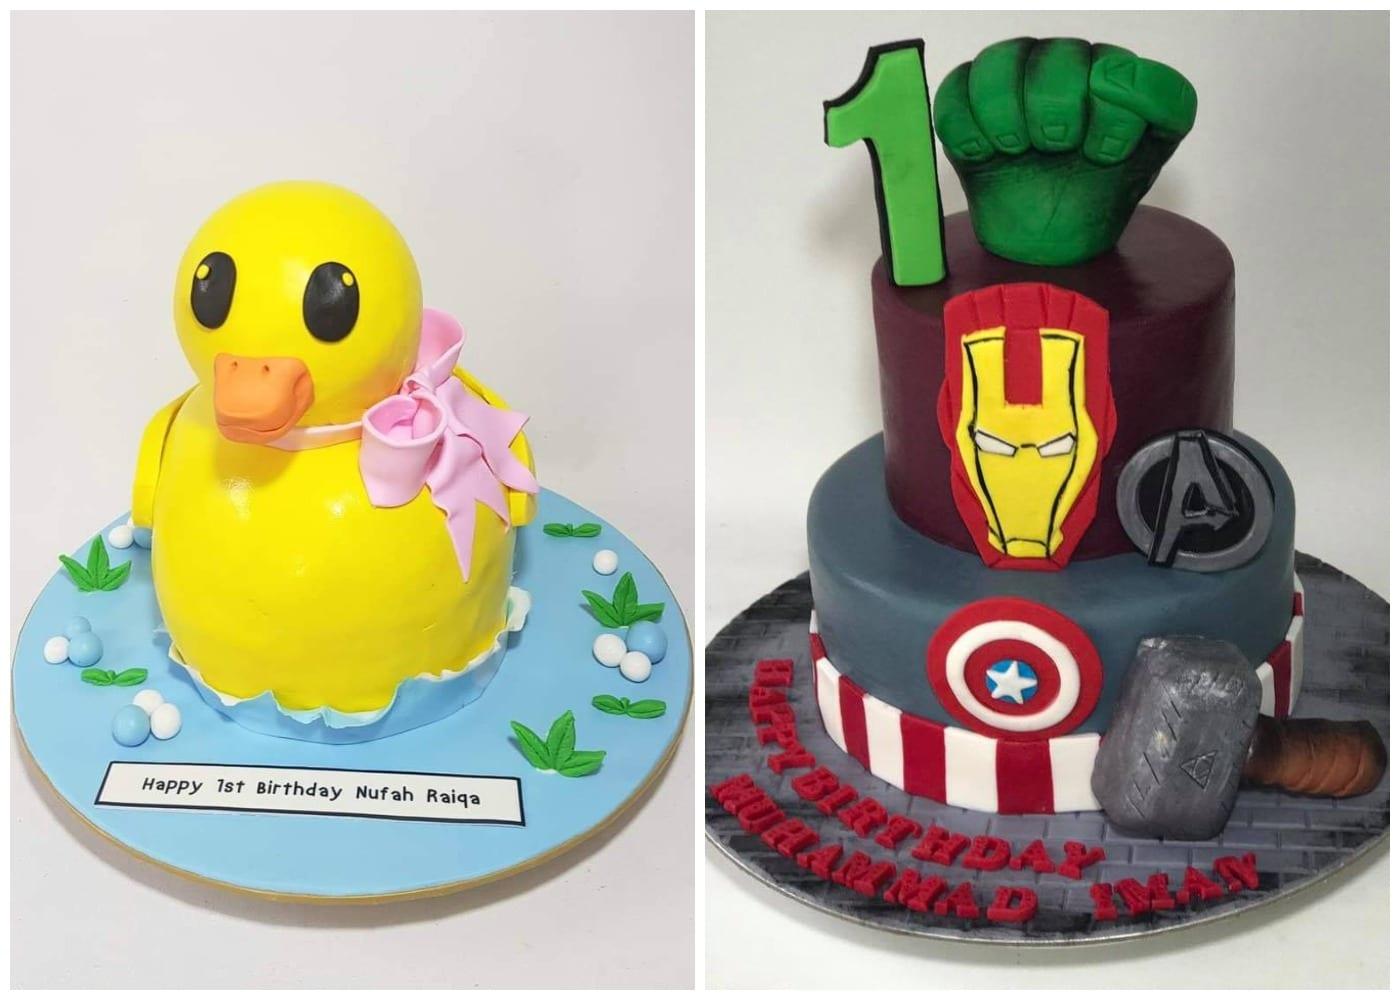 Best smash cakes in Singapore Sooperlicious Halal Cakes